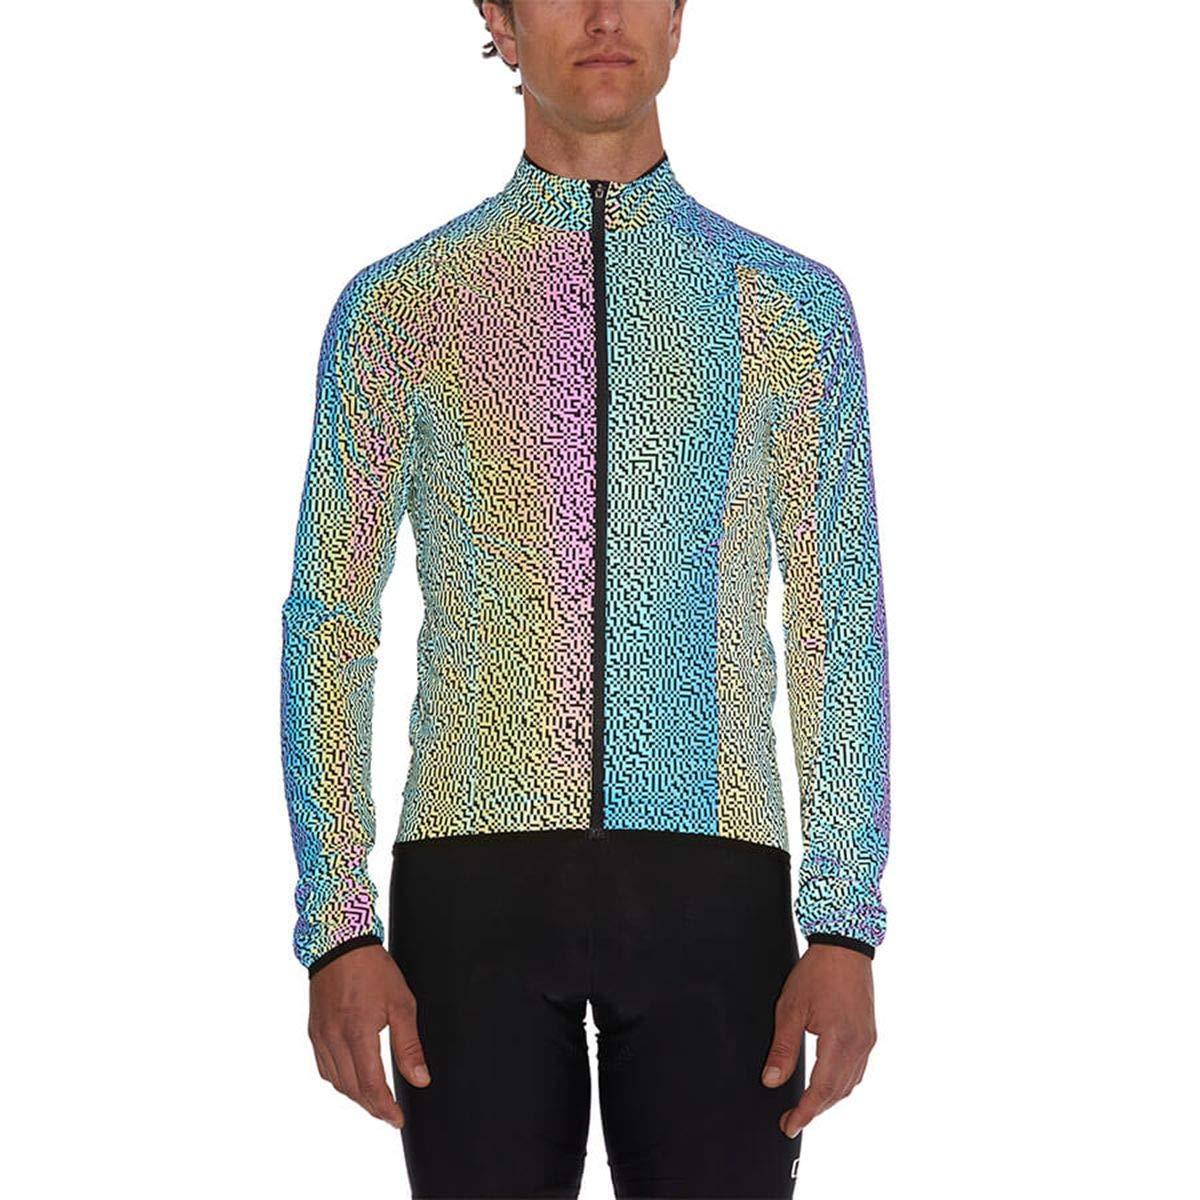 M Mens Electric Black Reflective Digi Giro Chrono Expert Reflective Wind Jacket